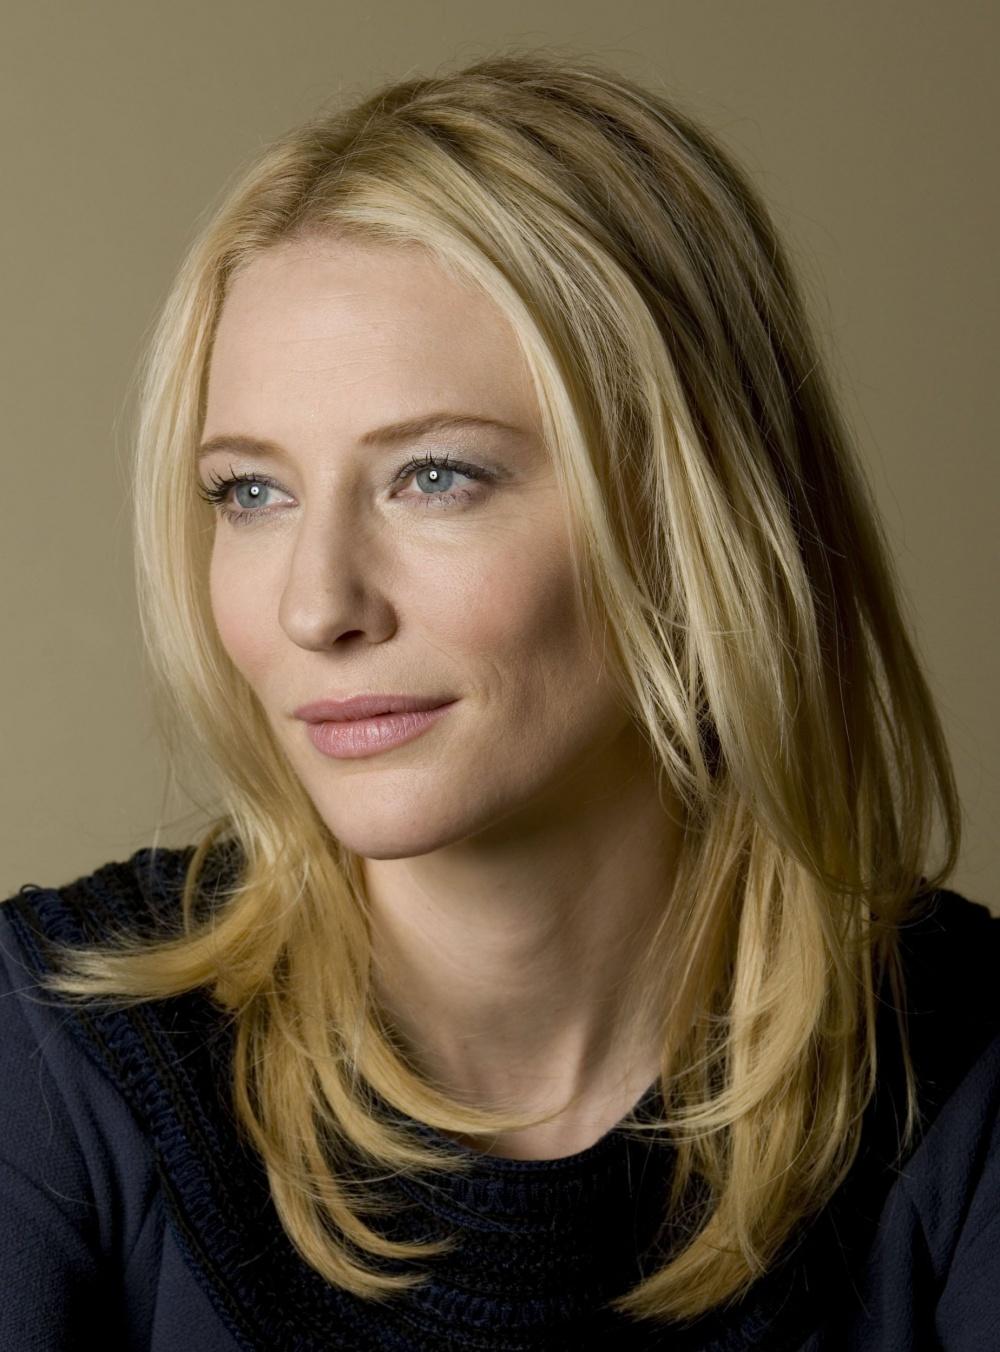 Poze Cate Blanchett Cate Blanchett